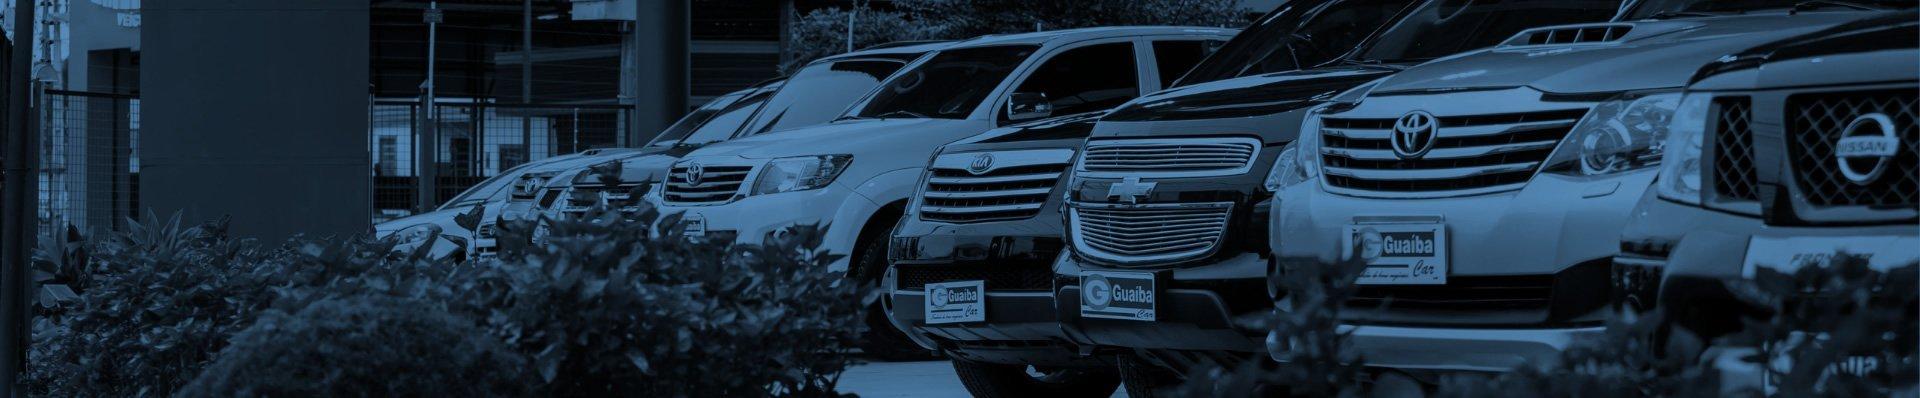 Banner Guaiba Car